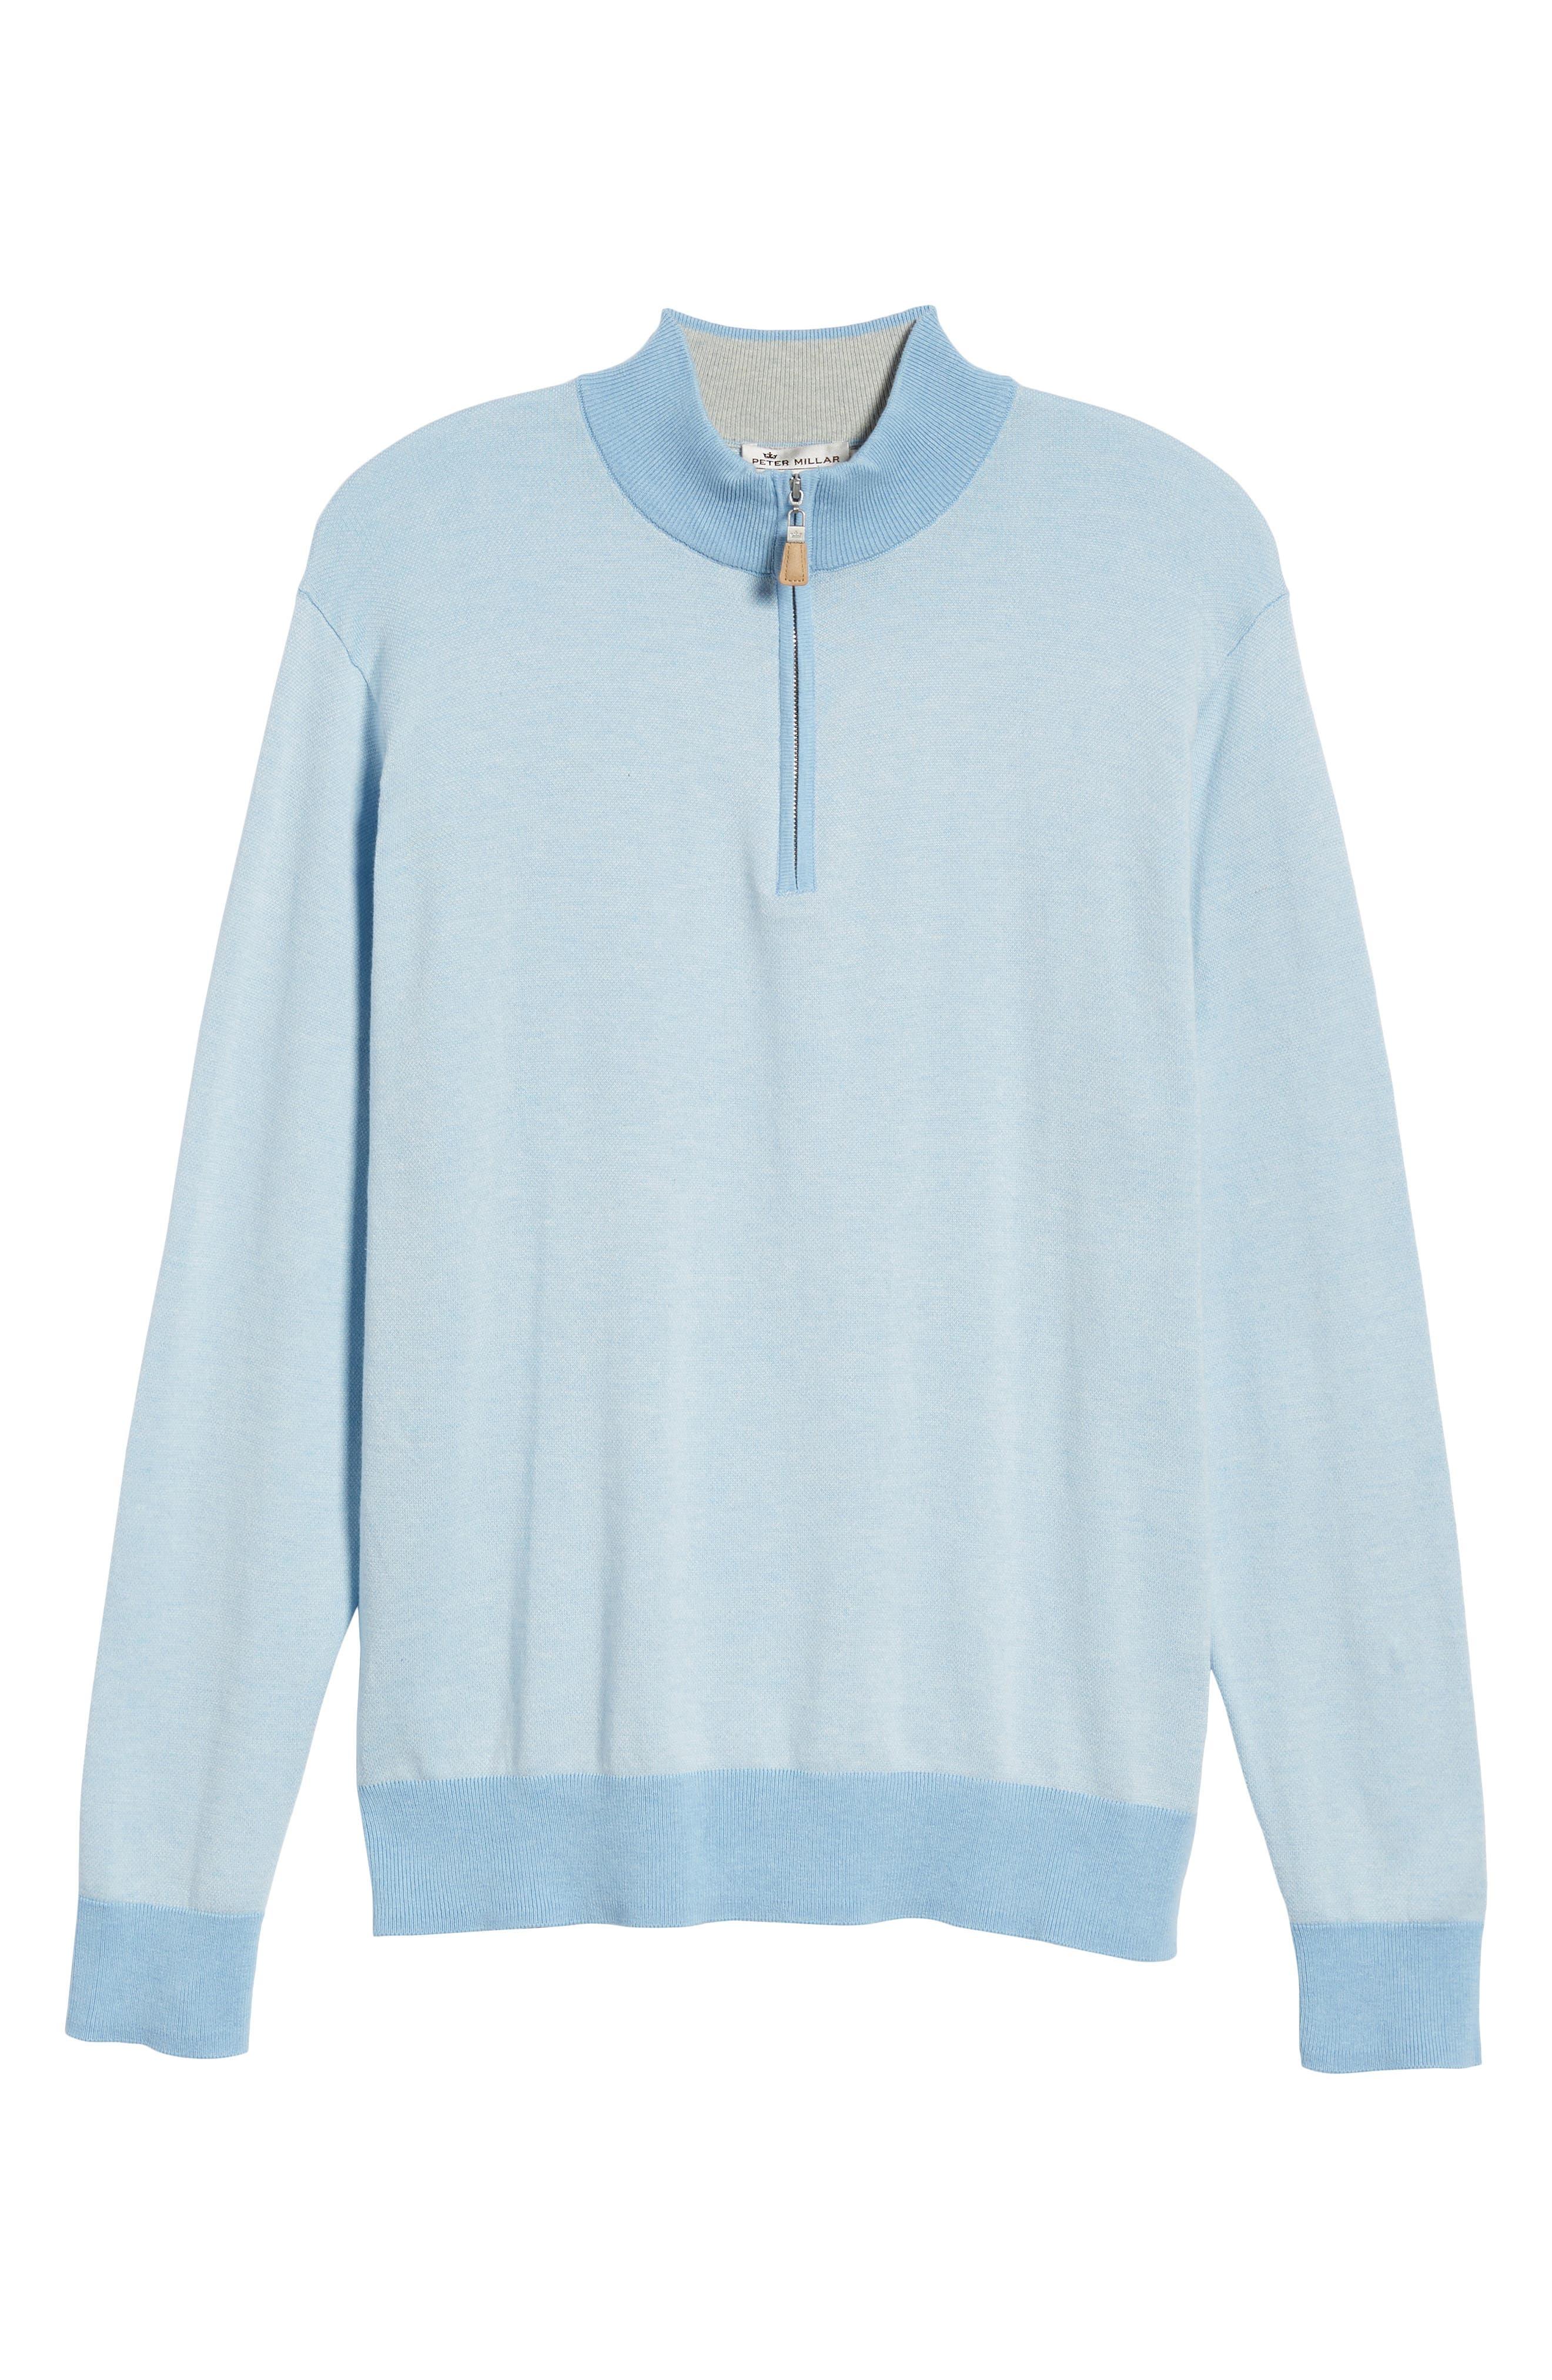 Crown Bird's Eye Cotton & Silk Quarter Zip Sweater,                             Alternate thumbnail 6, color,                             453